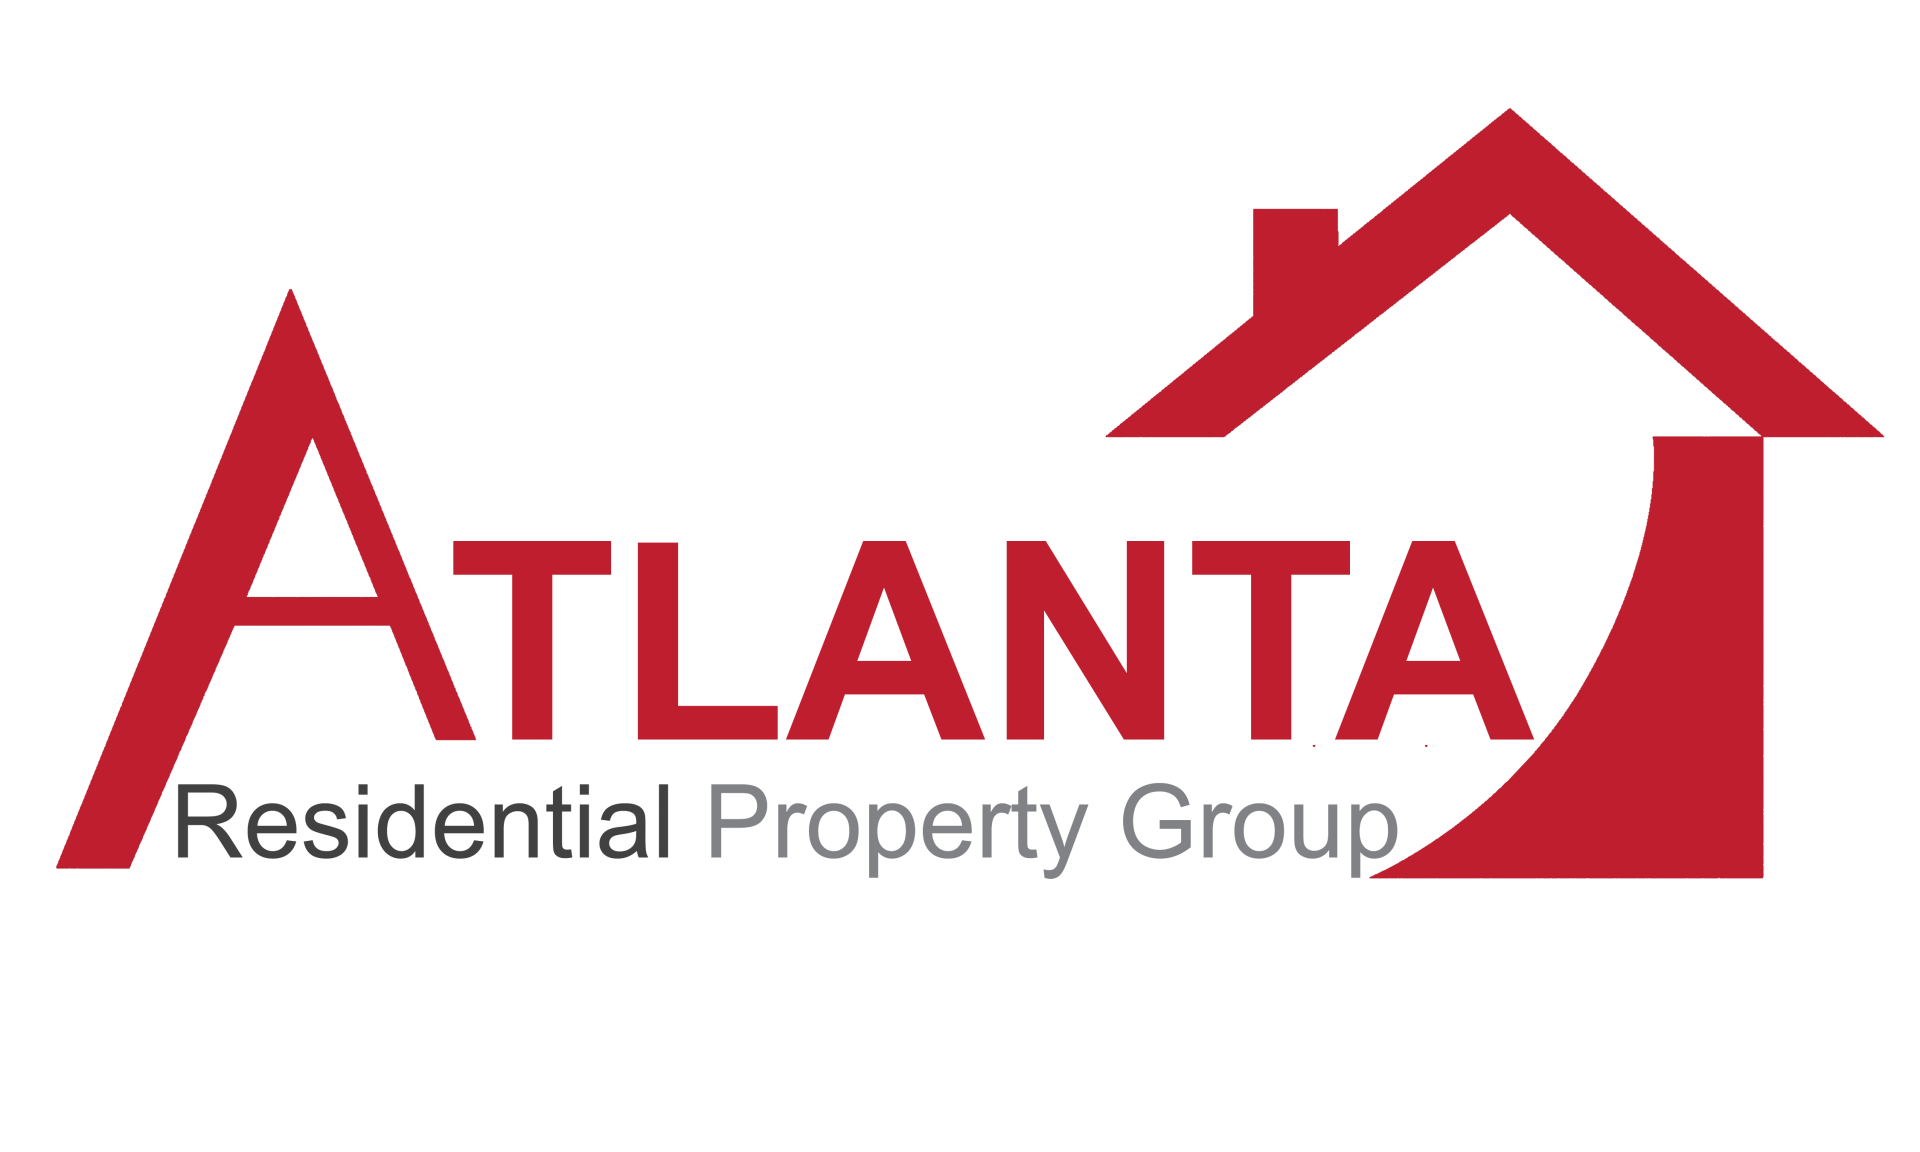 AtlantaRealEstateSupersite.com logo